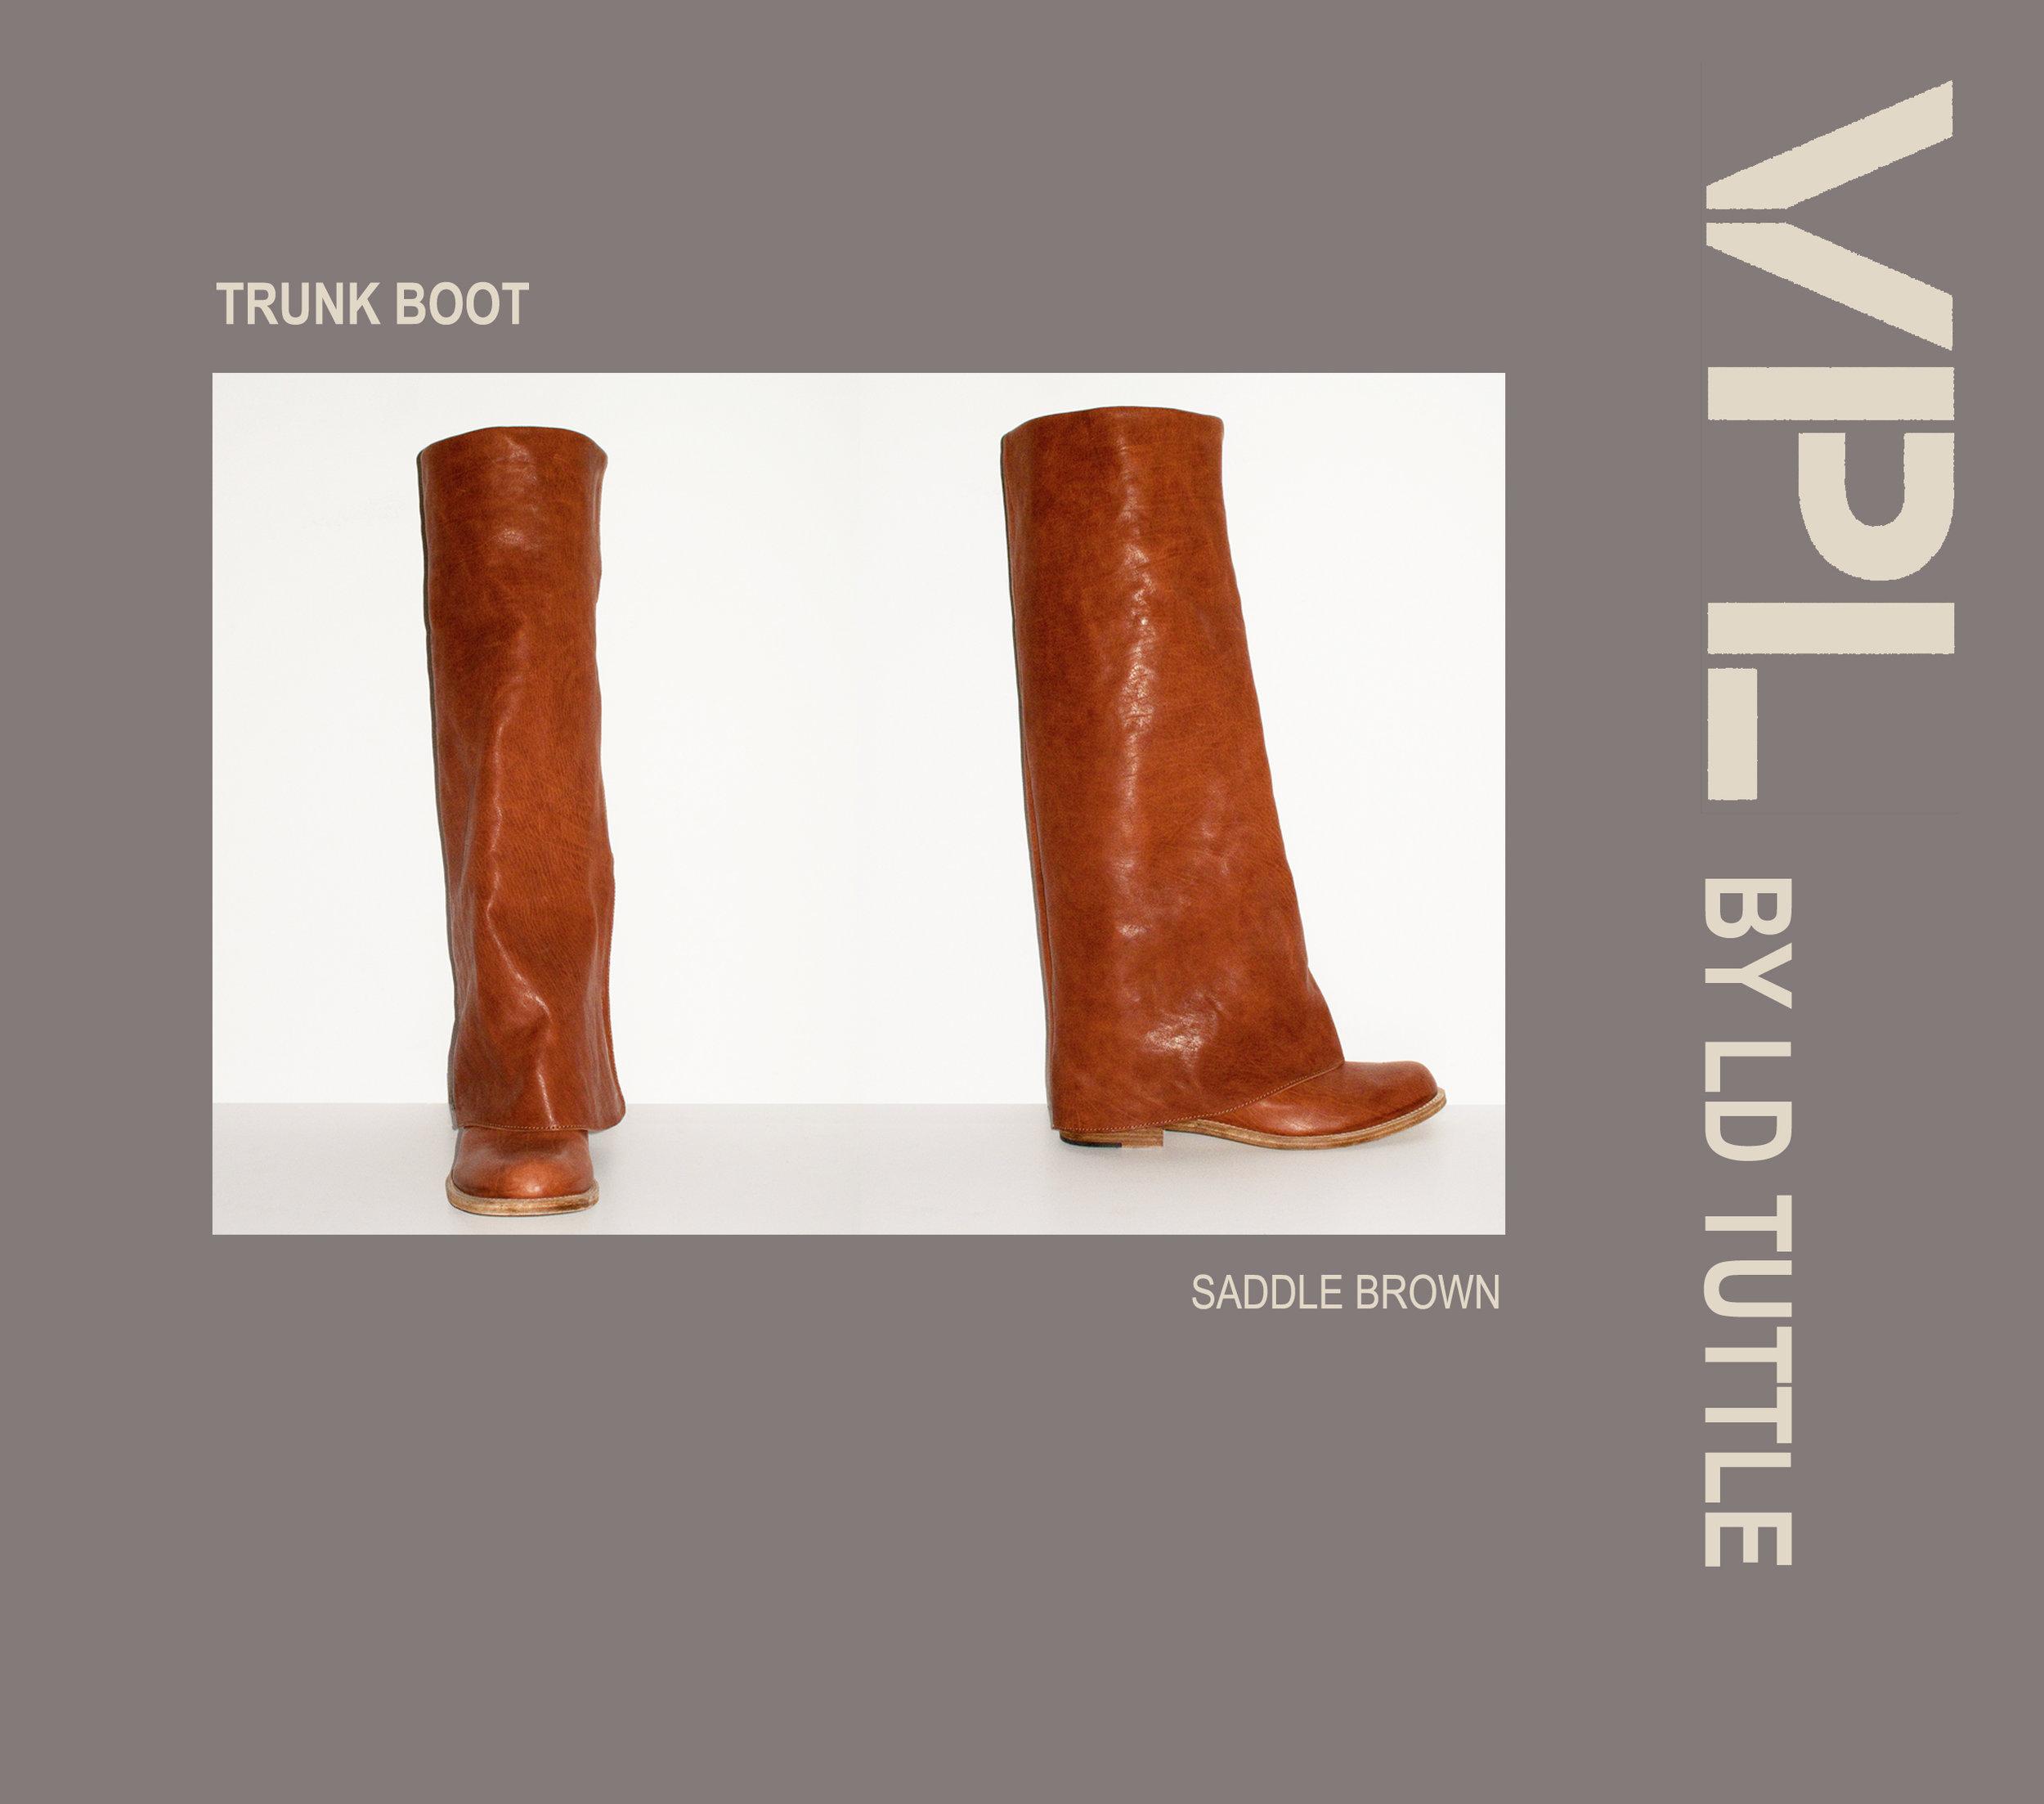 TRUNK BOOTS copy.jpg